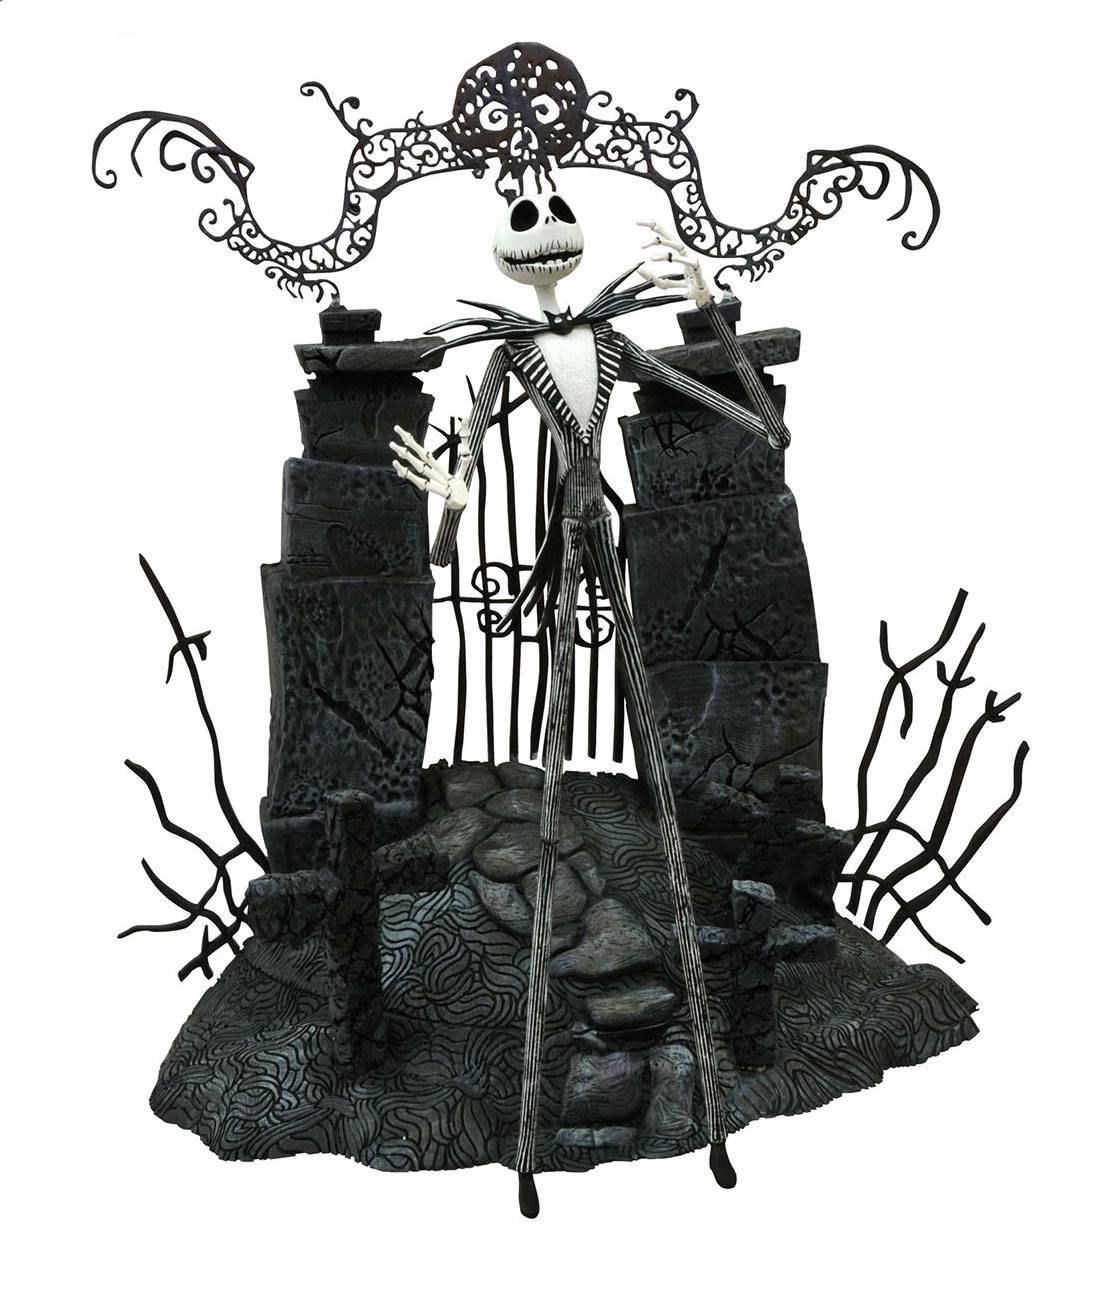 Nightmare before Christmas Select Action Figure Series 1 Jack Skellington 18 cm